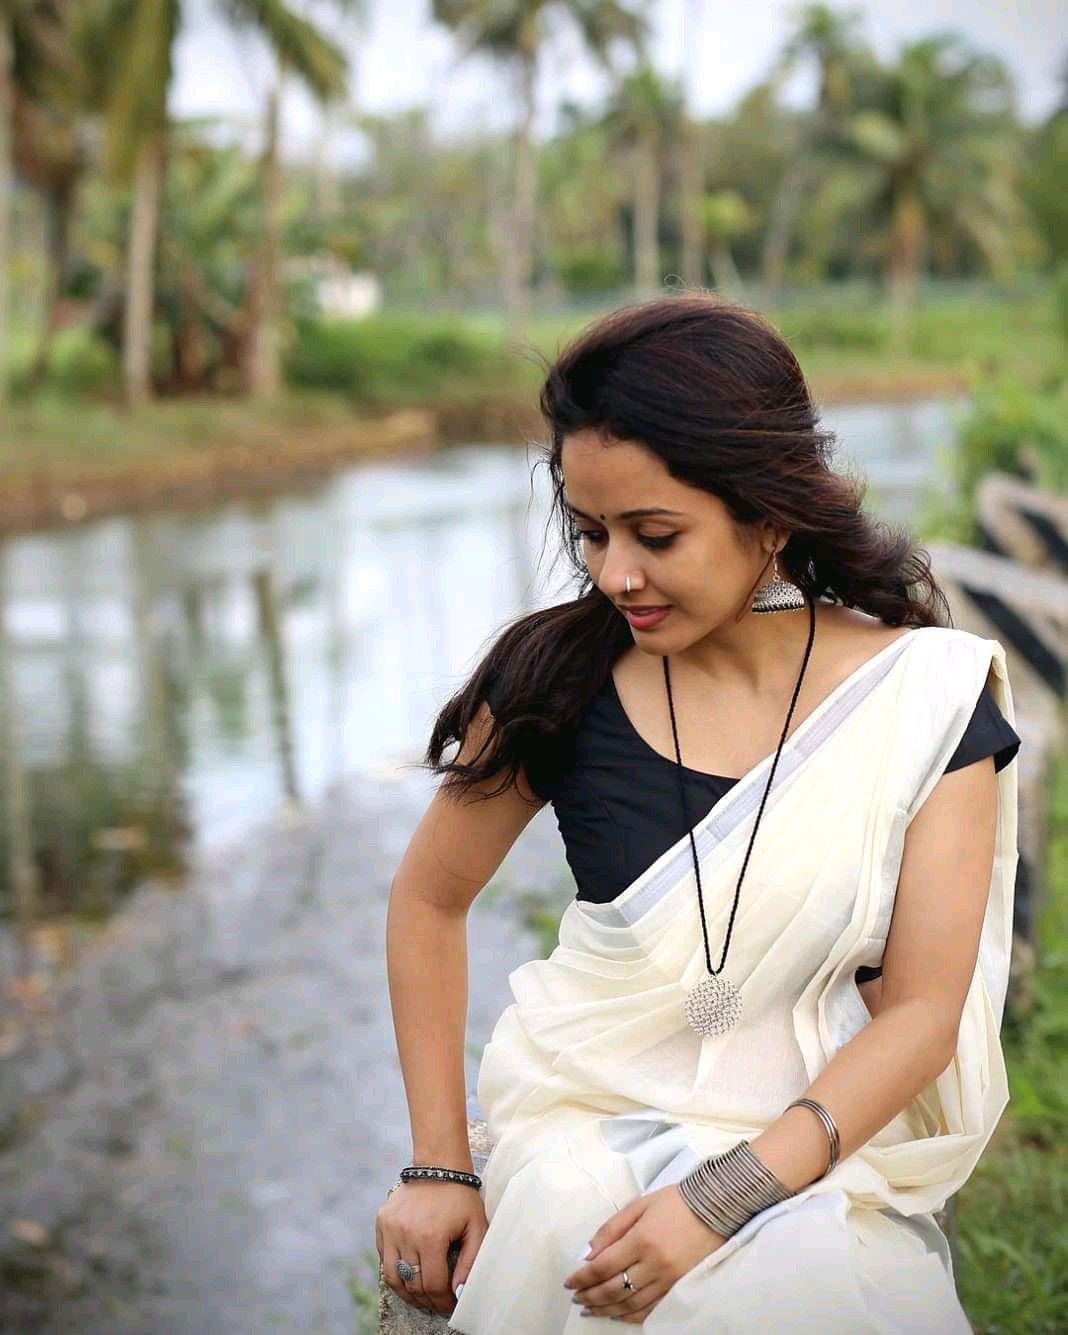 Kerala girls rep vidoi free dolound you porn tyler